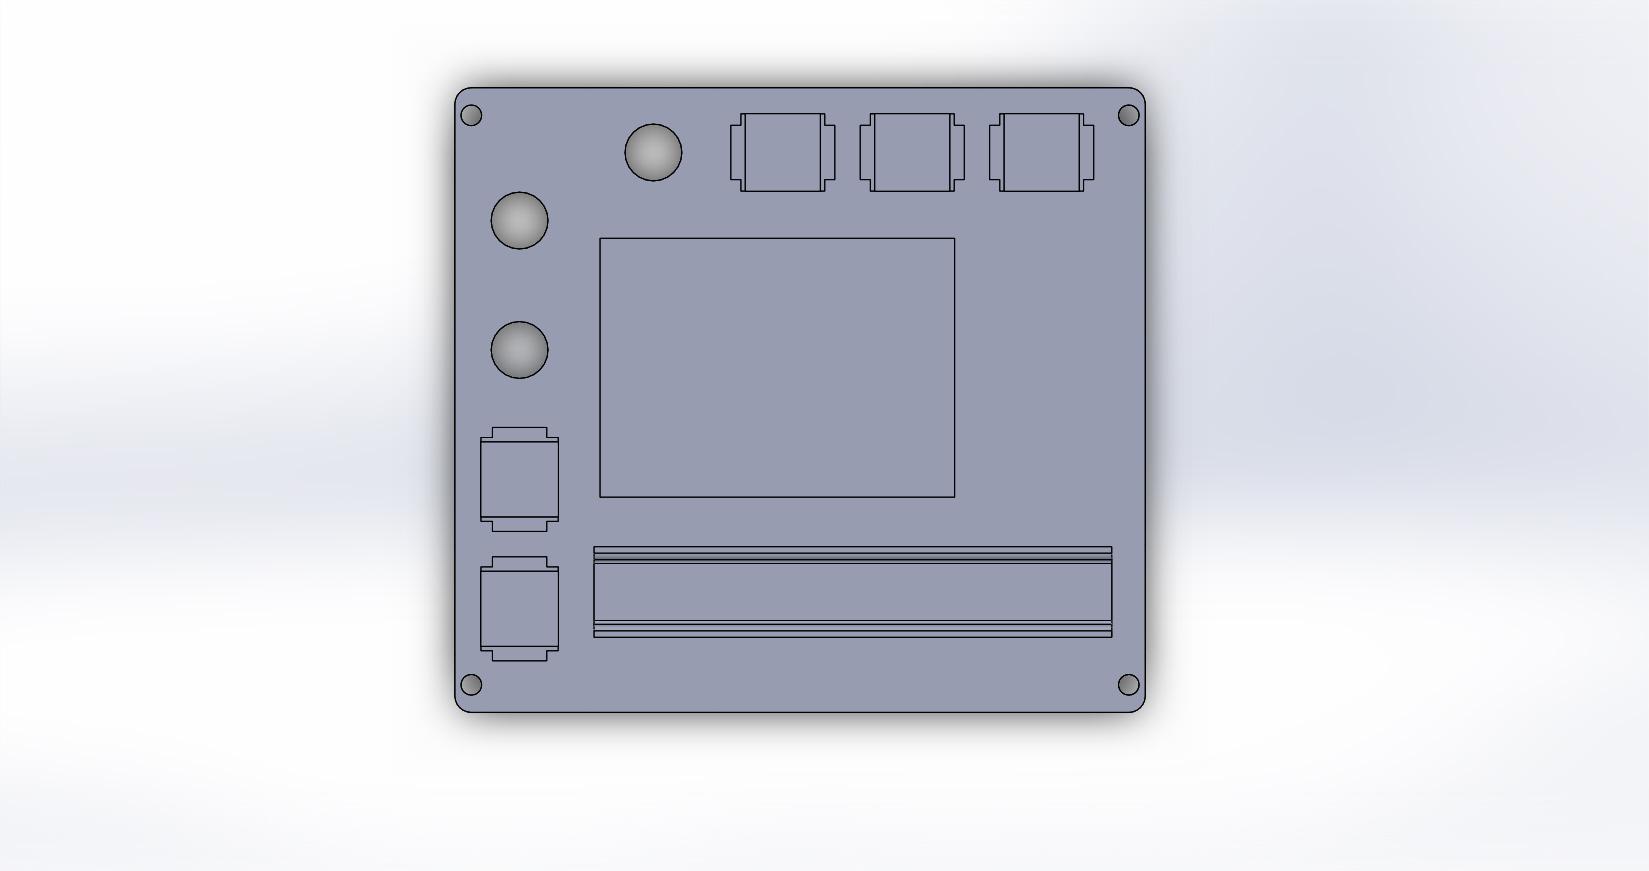 14_Control Board.JPG